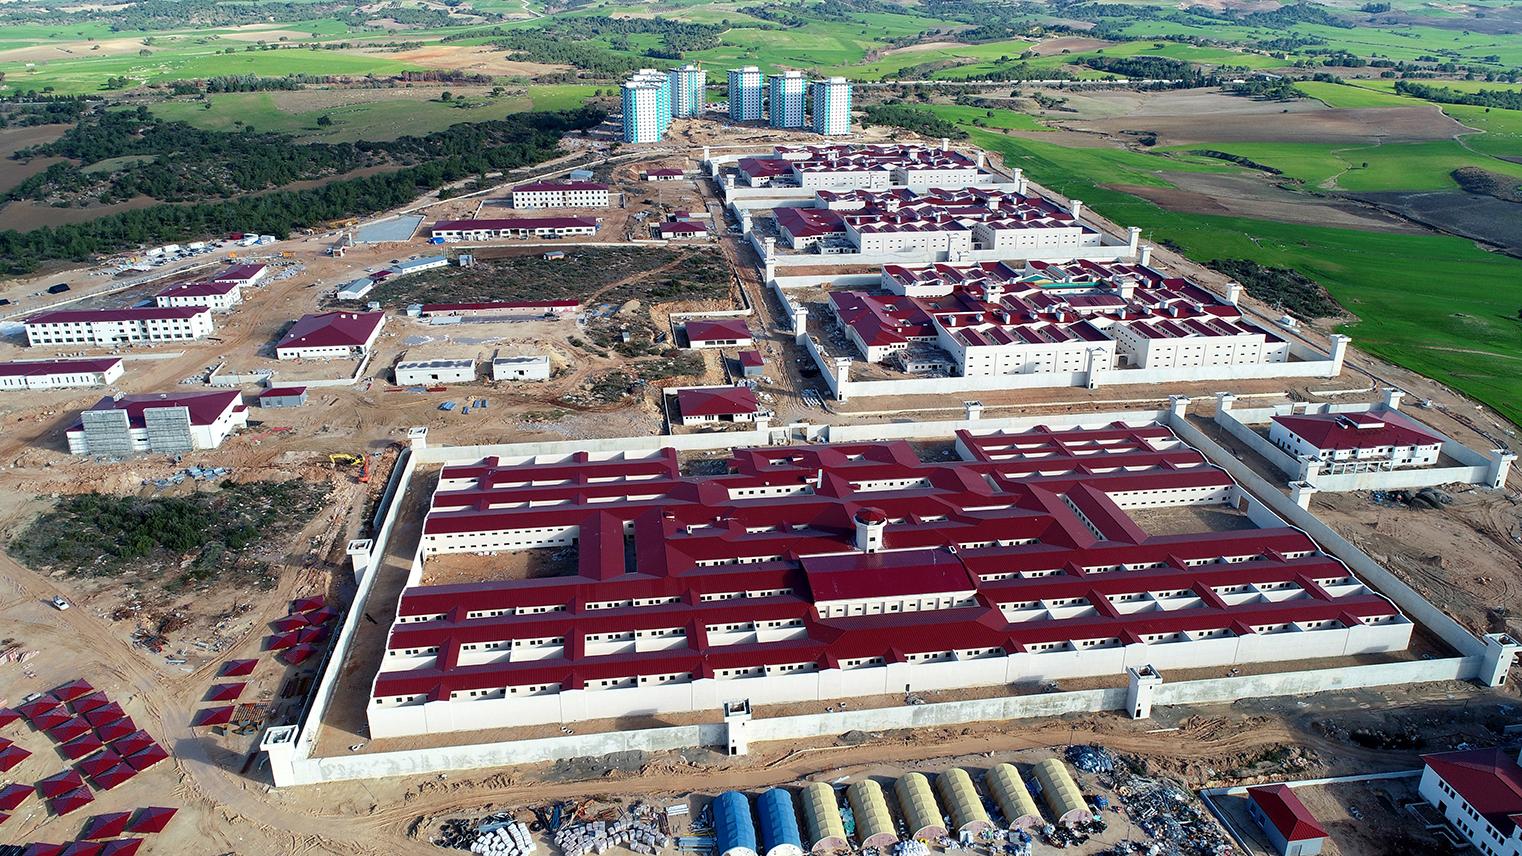 A construction site for a Turkish prison complex